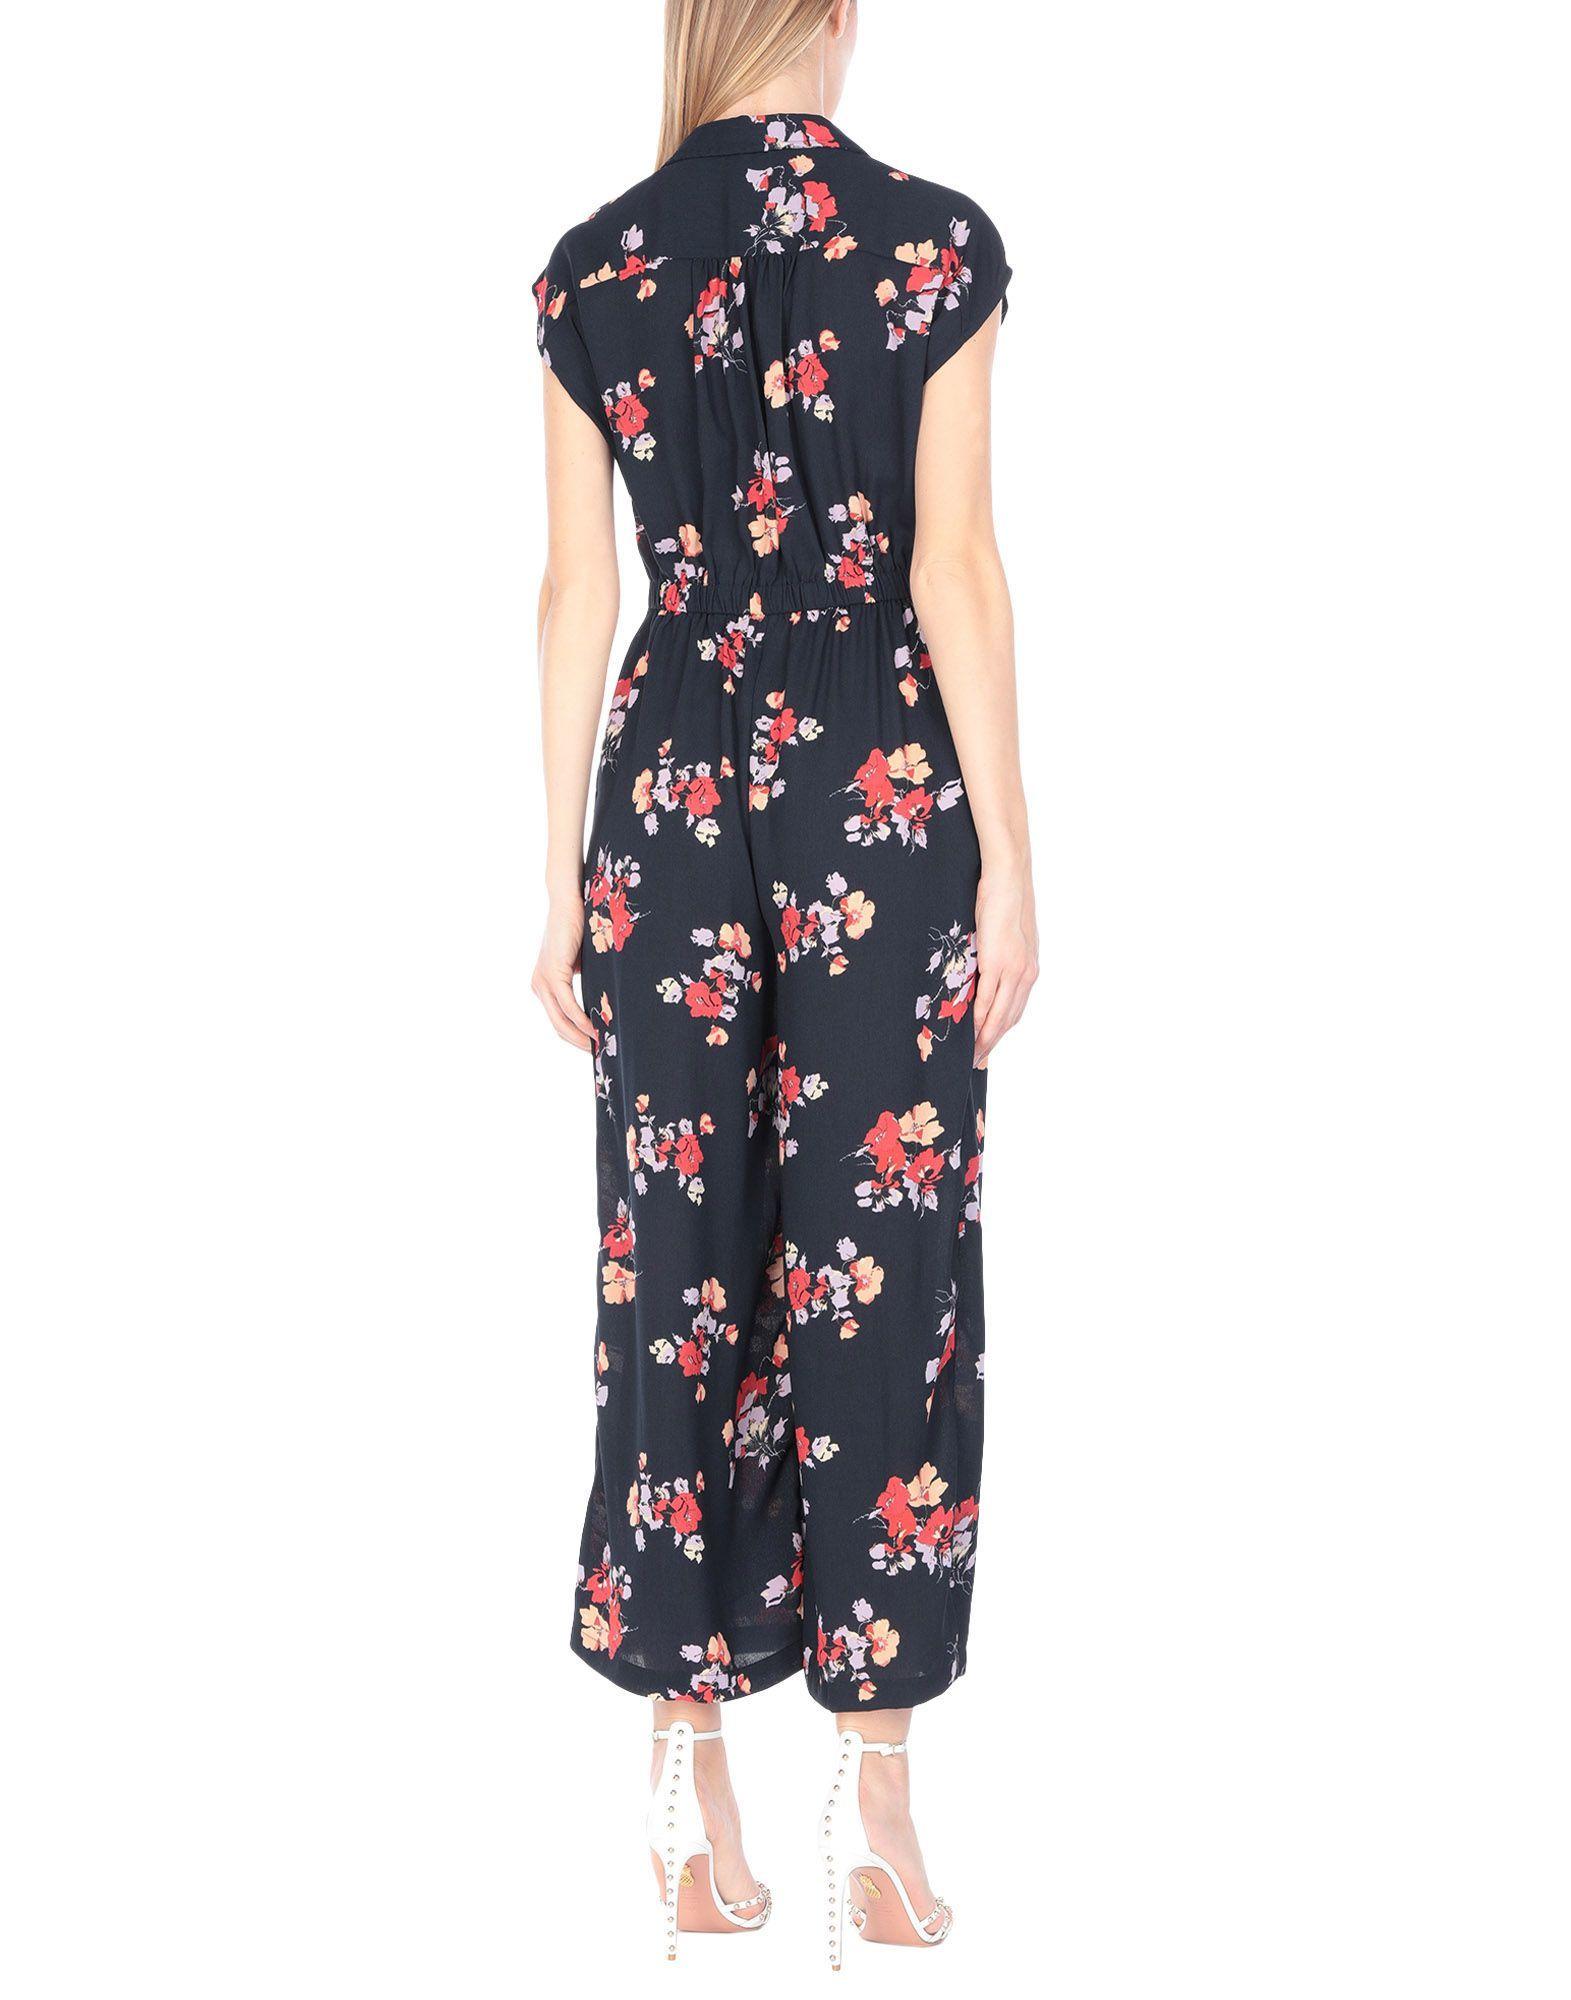 Vero Moda Dark Blue Floral Design Jumpsuit